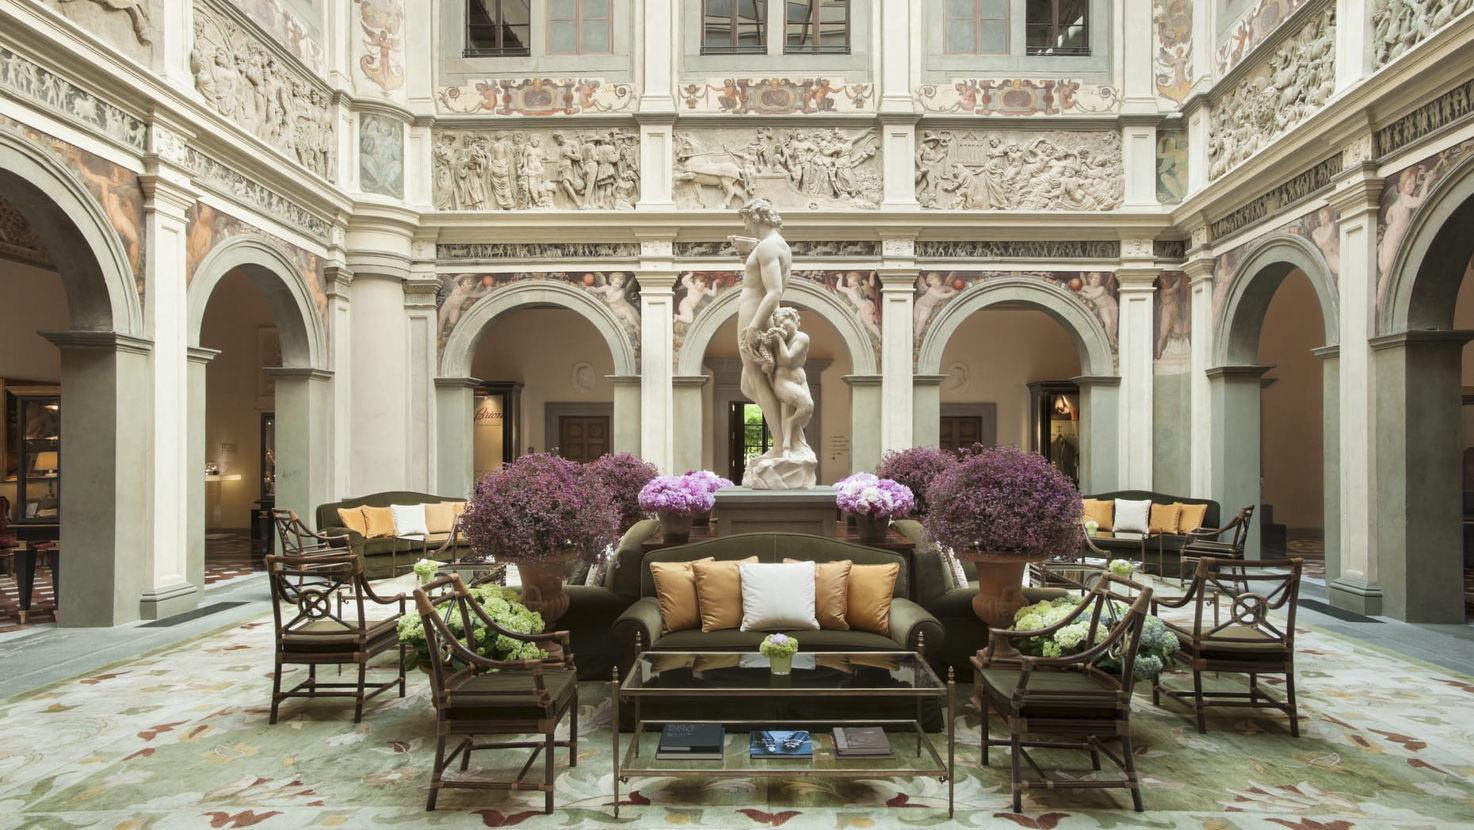 Loggia of Four Seasons Hotel